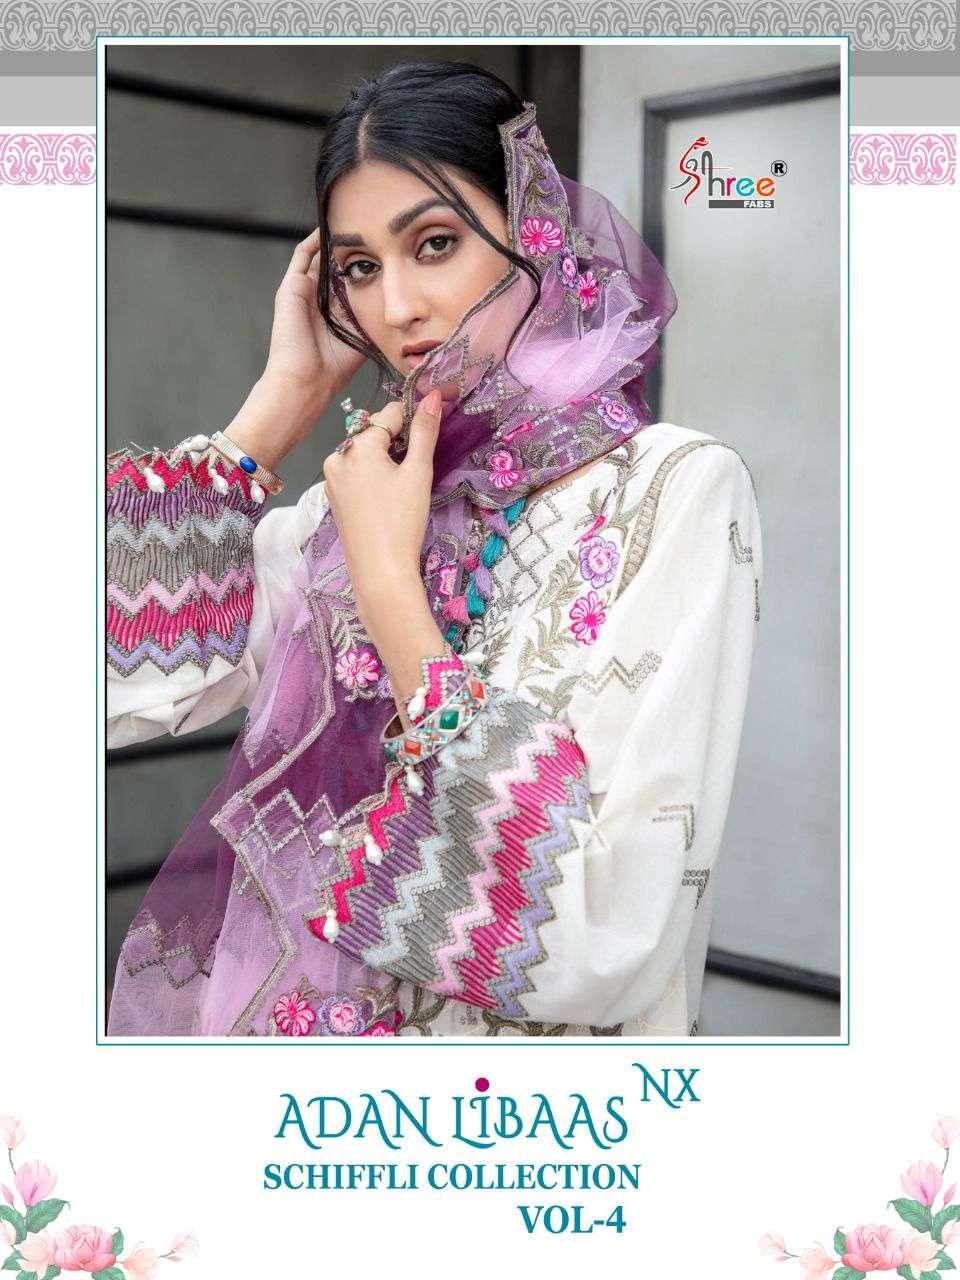 Shree Fabs Adan Libaas Schiffli Collection Vol 4 Nx Cotton Dress Wholesaler